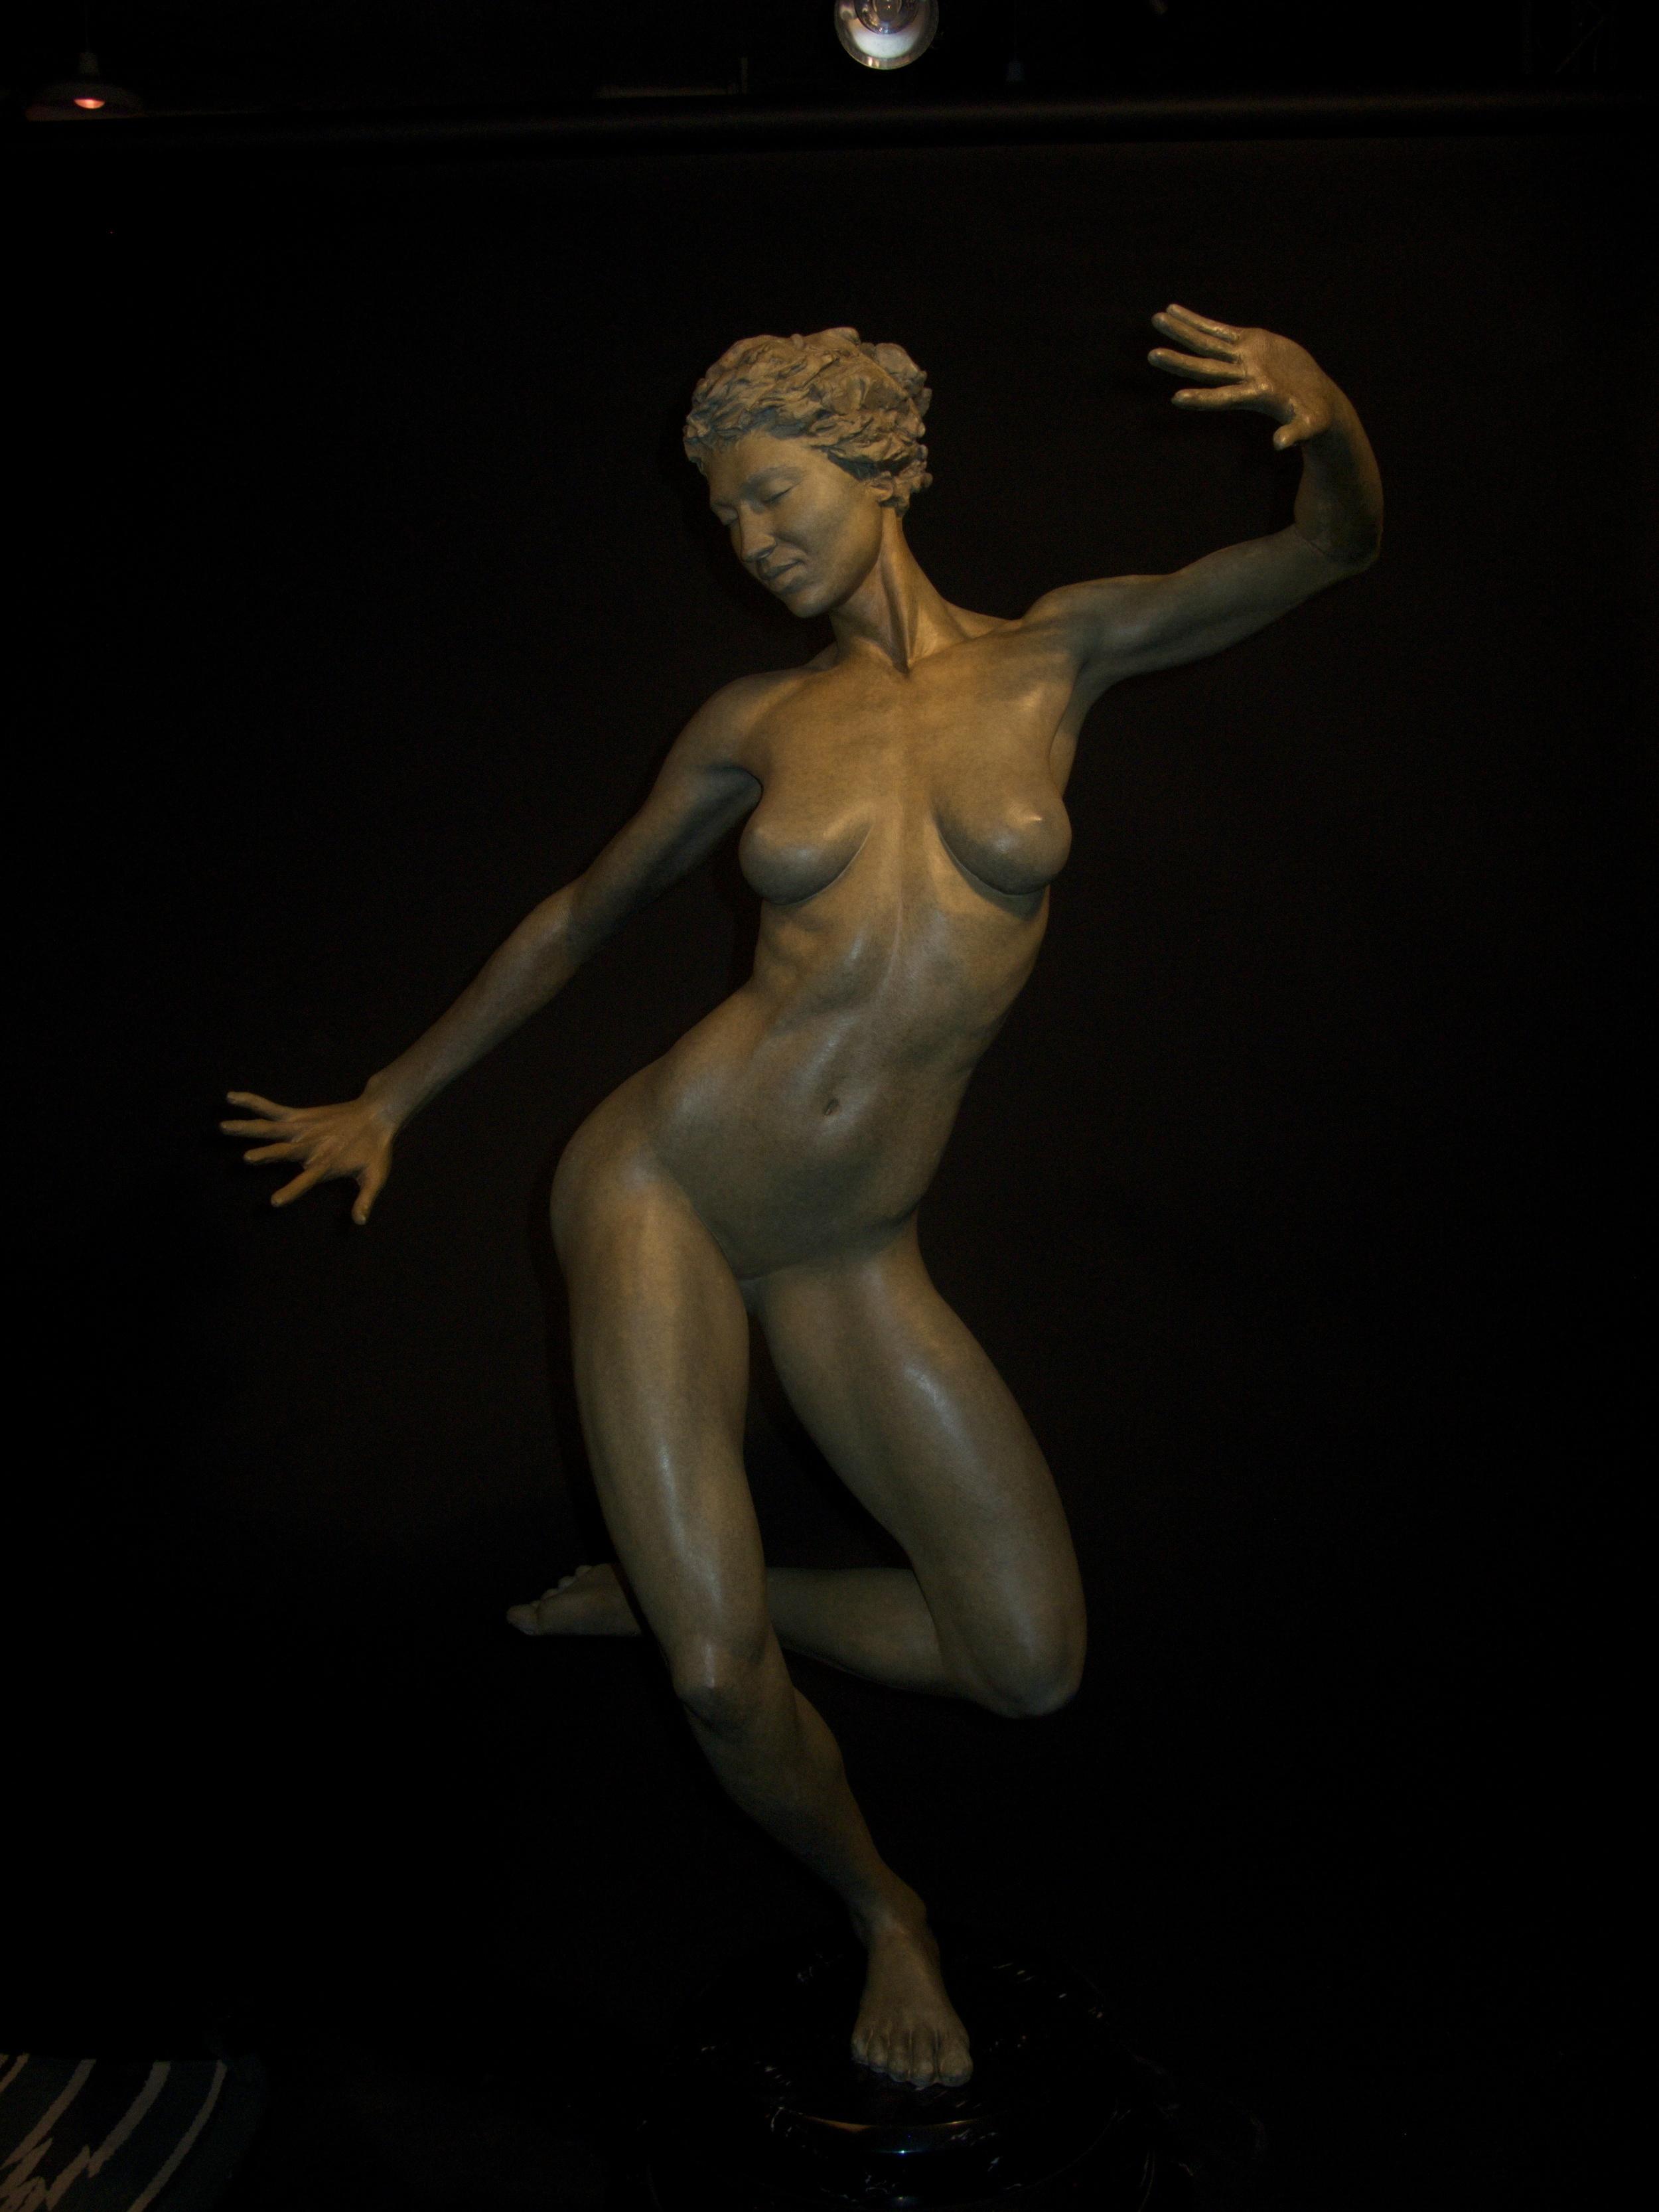 Deja • Bliss Dance • 0'x0' • Bronze • 2008